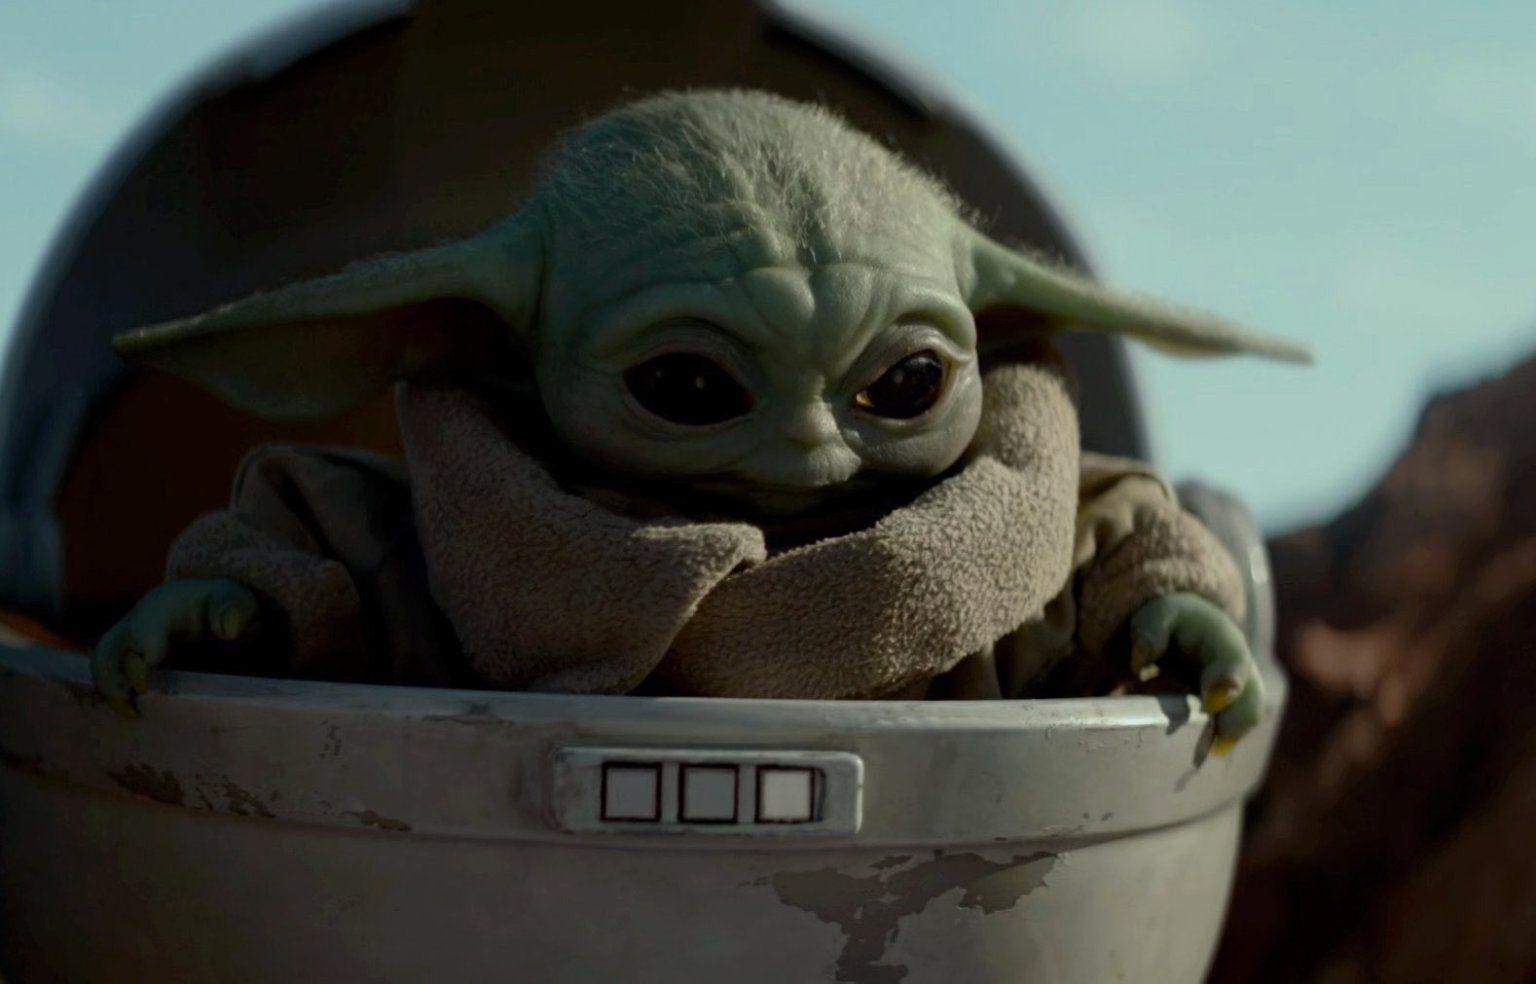 17 Beautiful Baby Yoda Wallpapers Yoda Wallpaper Star Wars Yoda Star Wars Memes